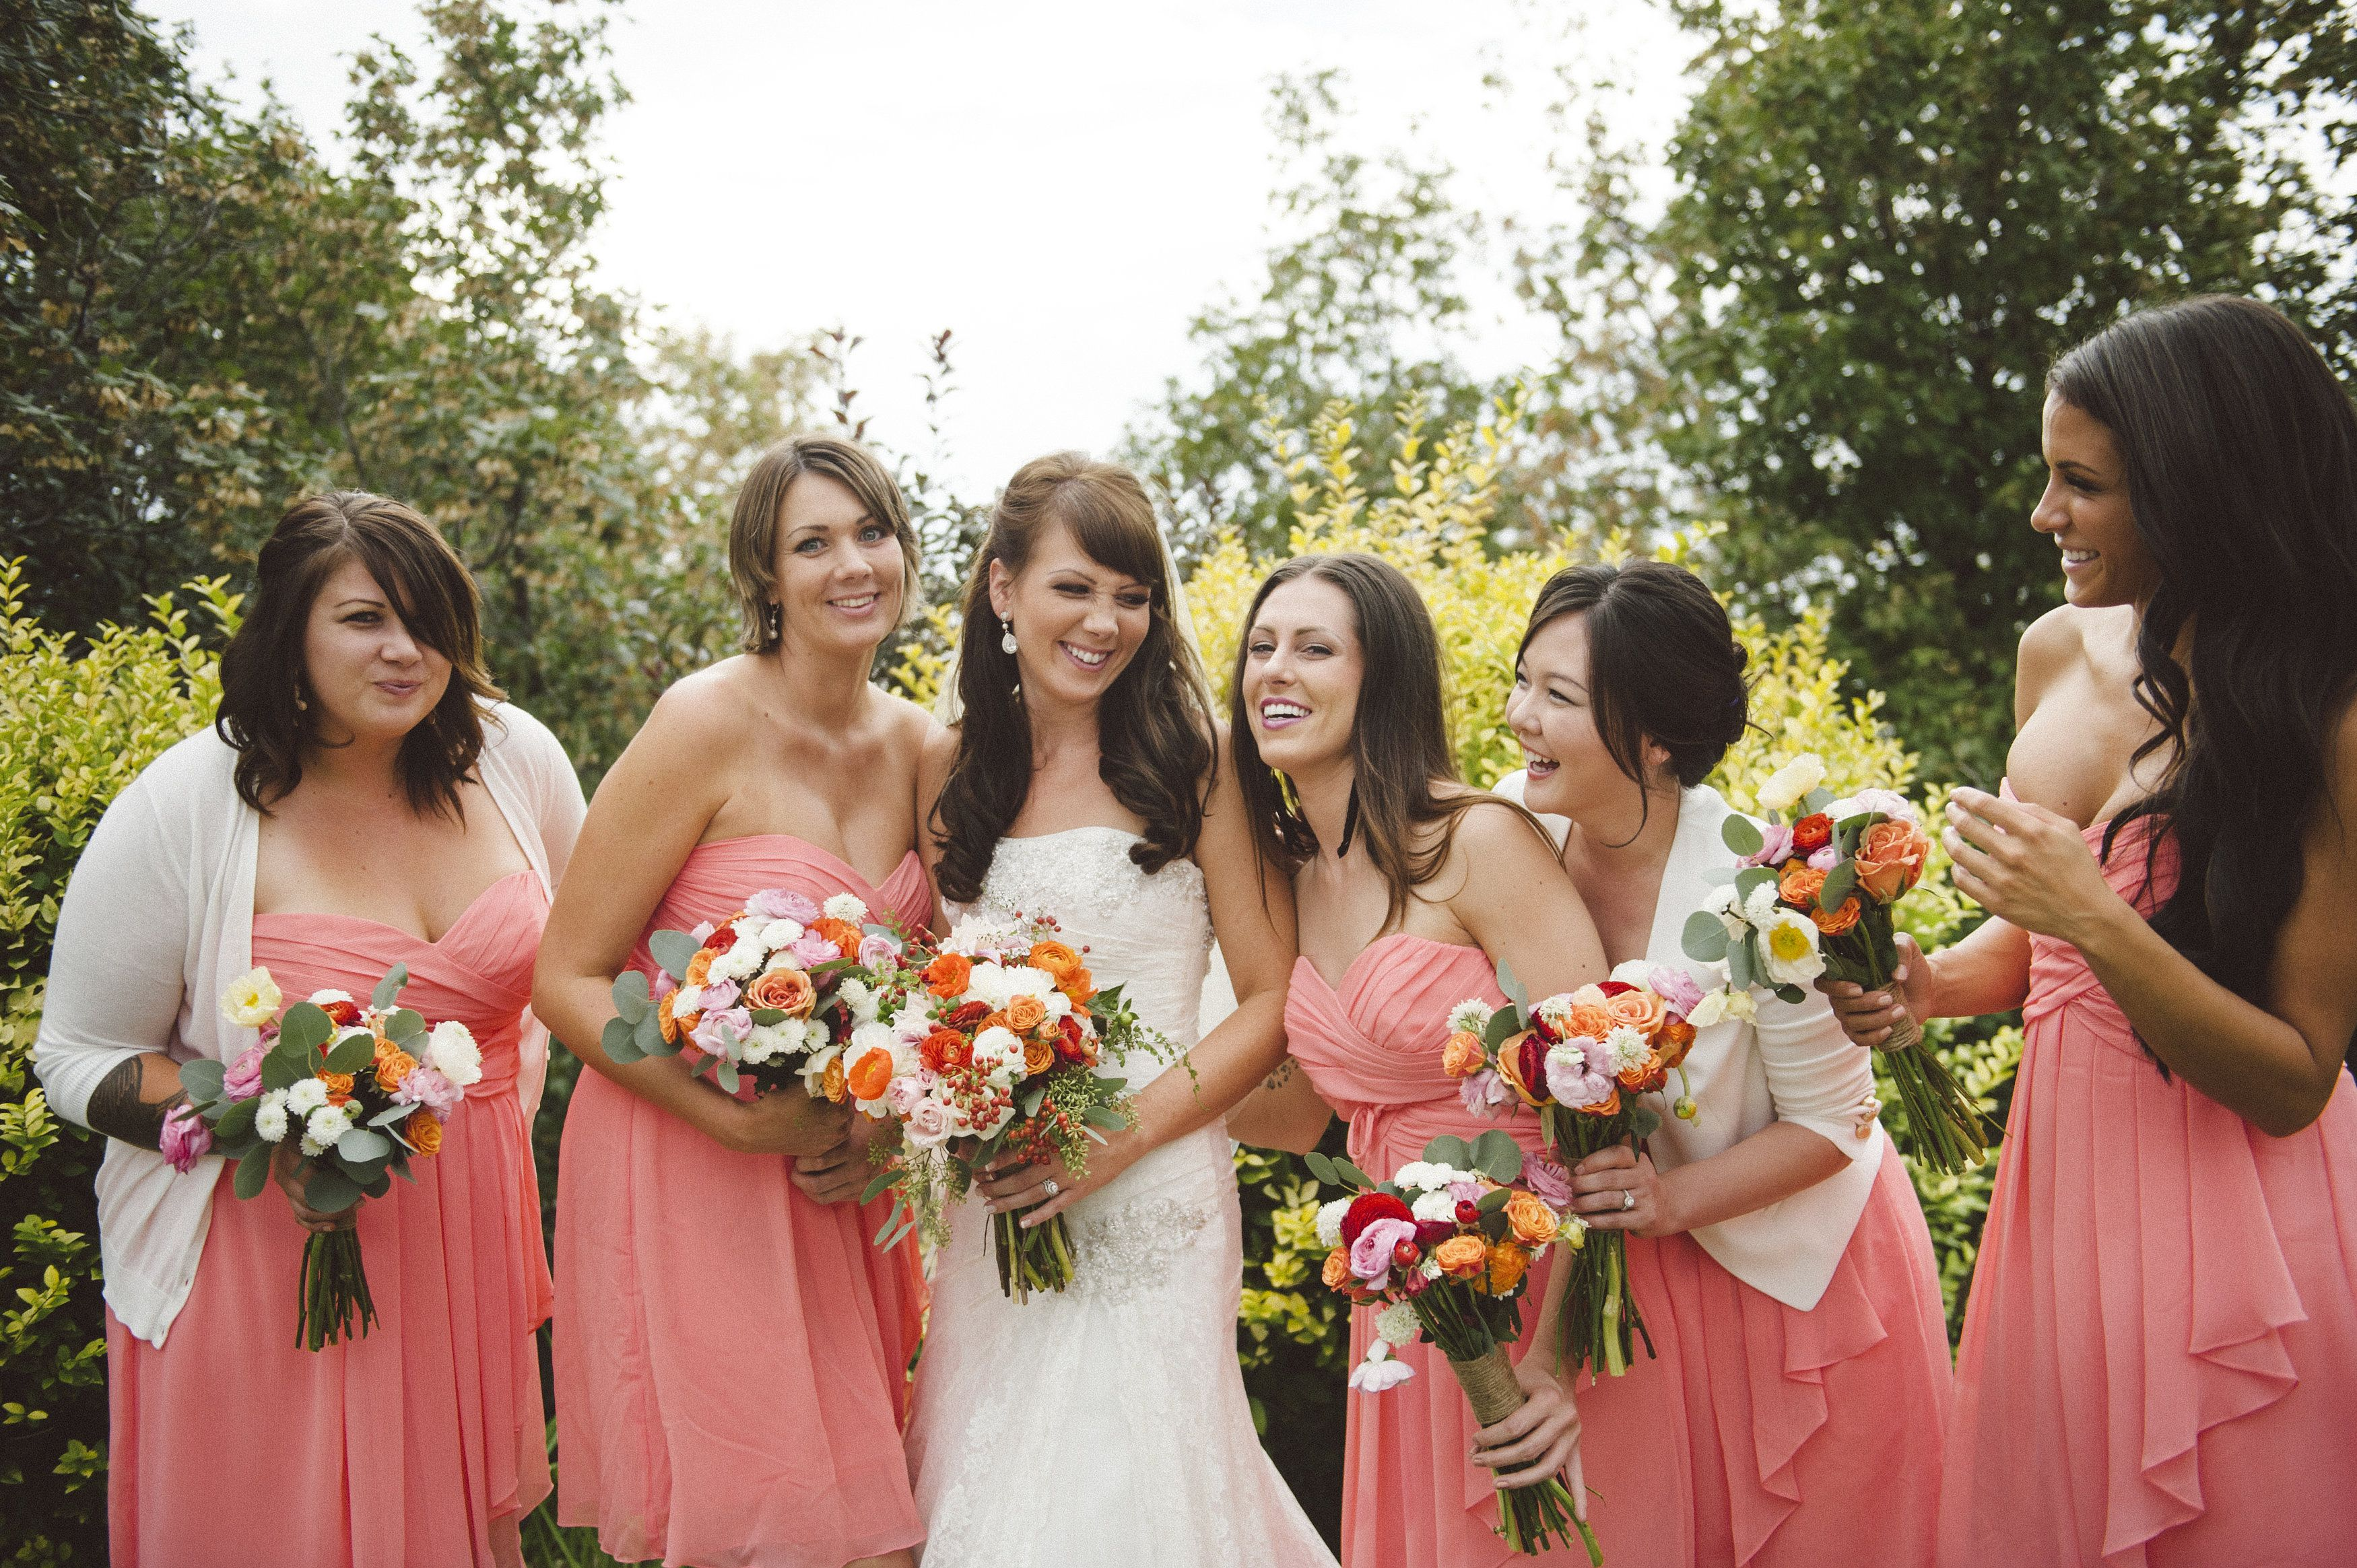 Coral reef bridesmaids dresses davids bridal my wedding bridesmaid ombrellifo Choice Image